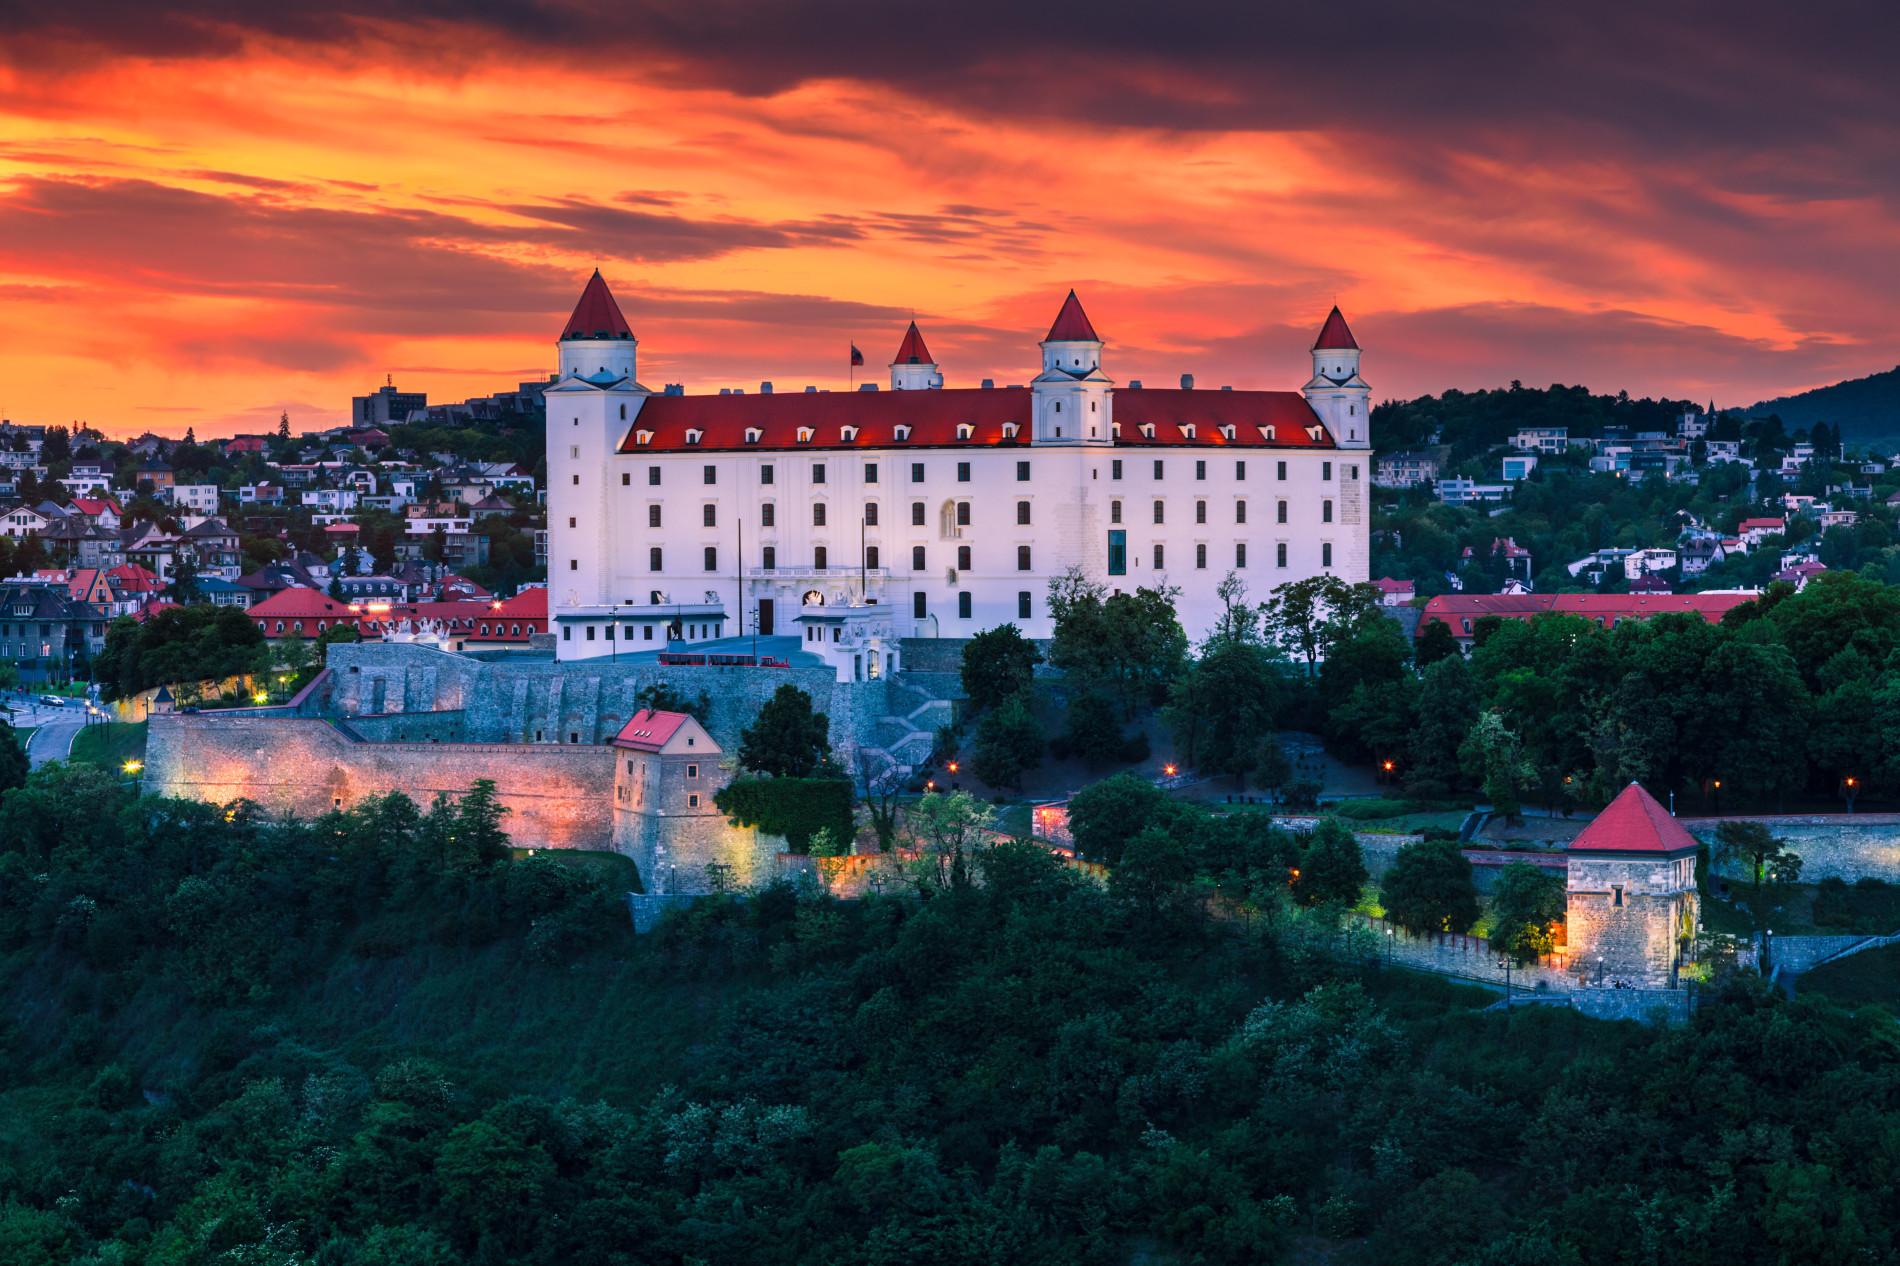 Burg Pressburg